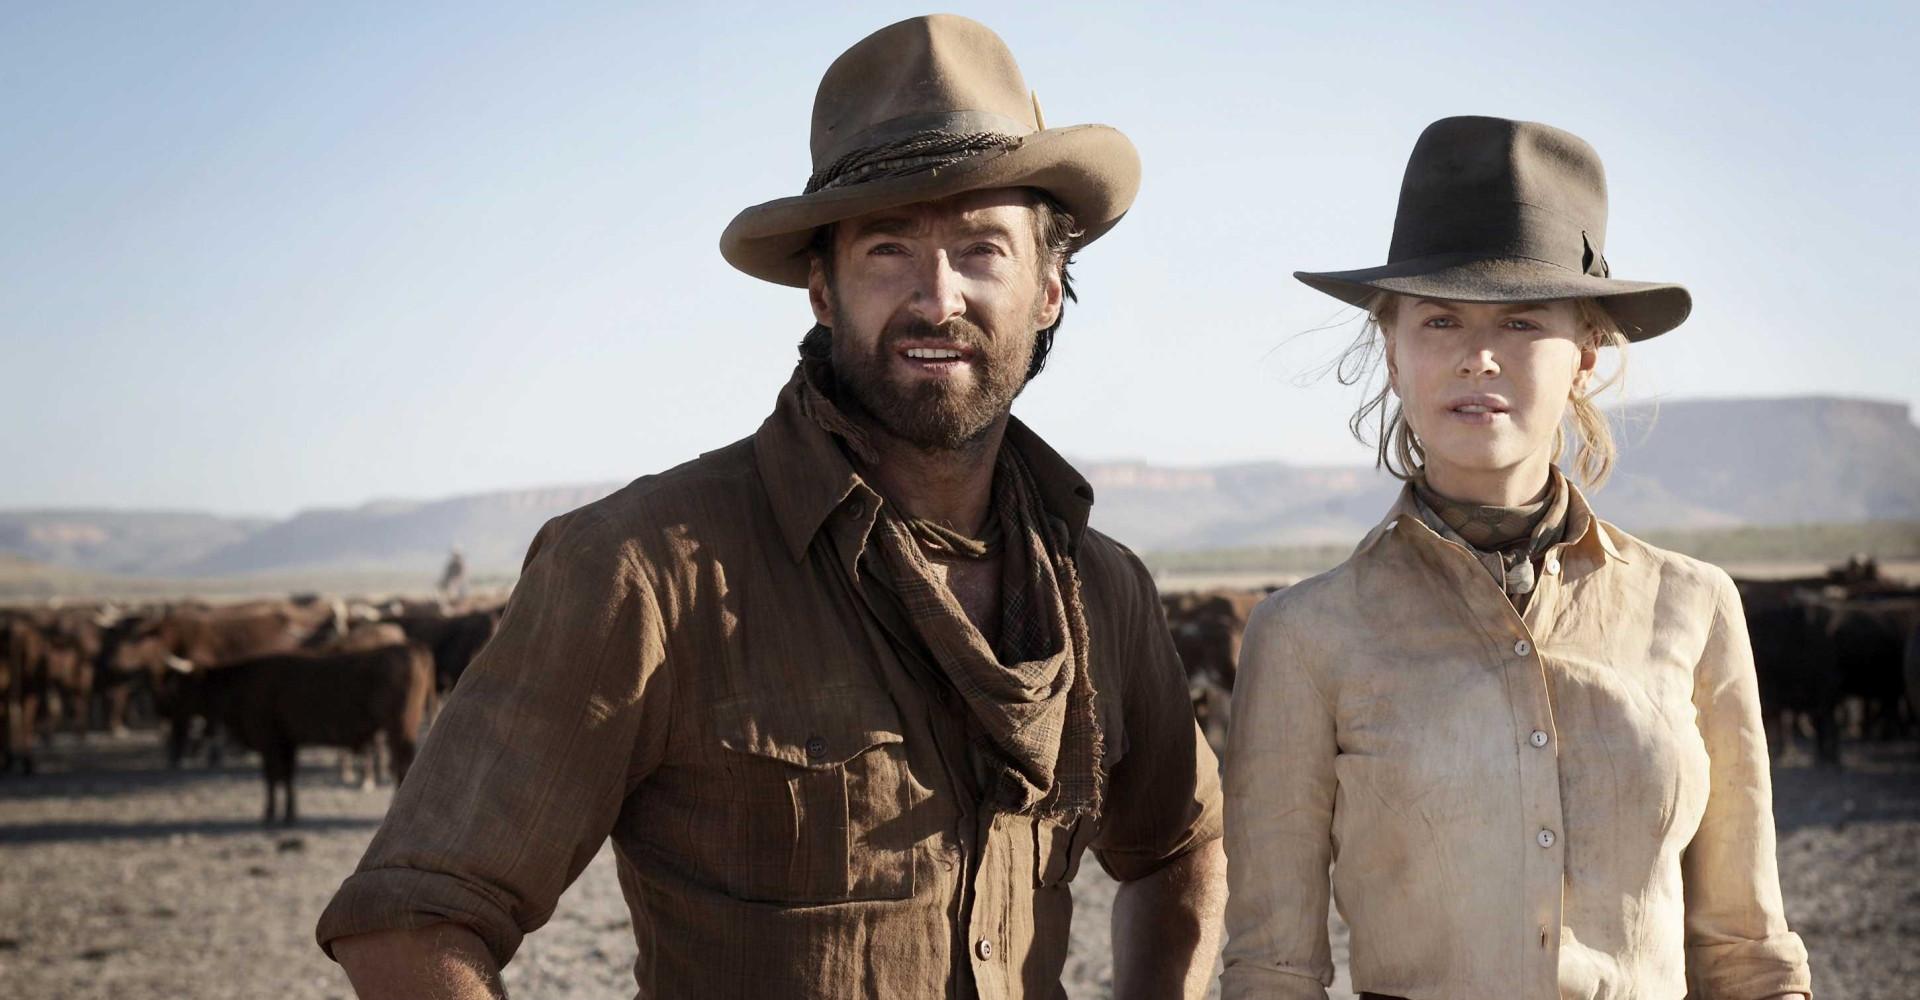 Australia's most awarded films